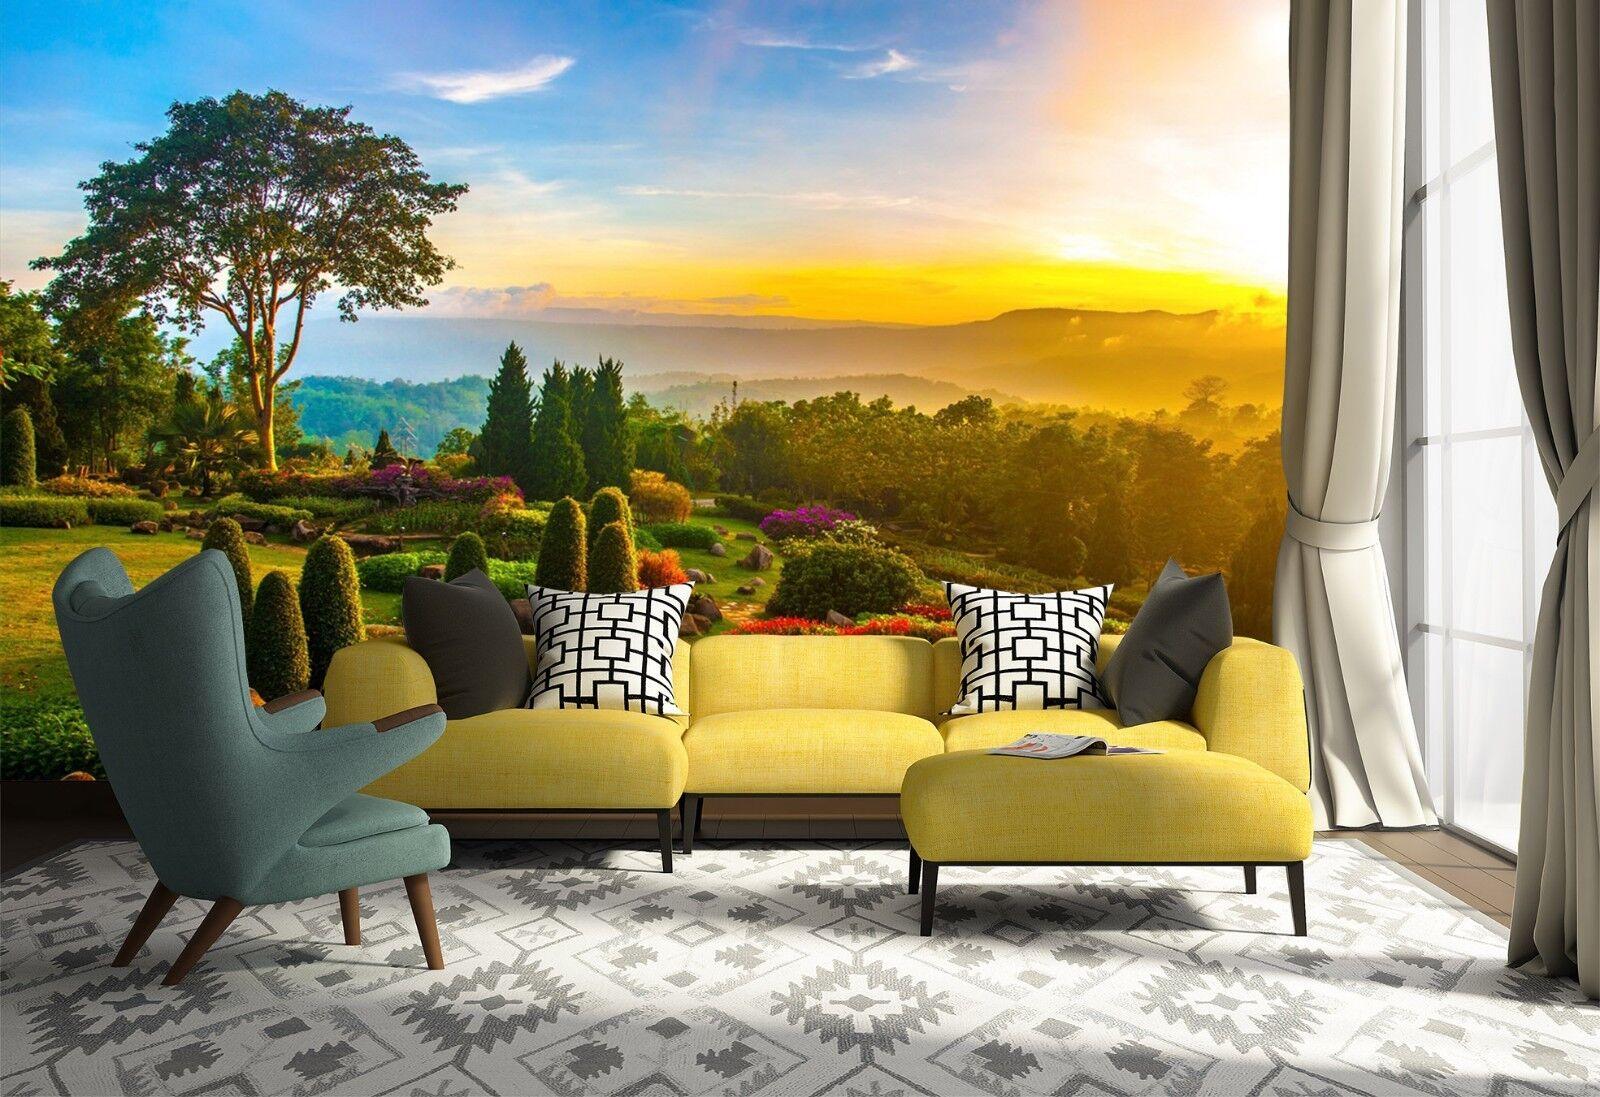 3D Landscape Tree 7086 Wallpaper Mural Wall Print Wall Wallpaper Murals US Lemon